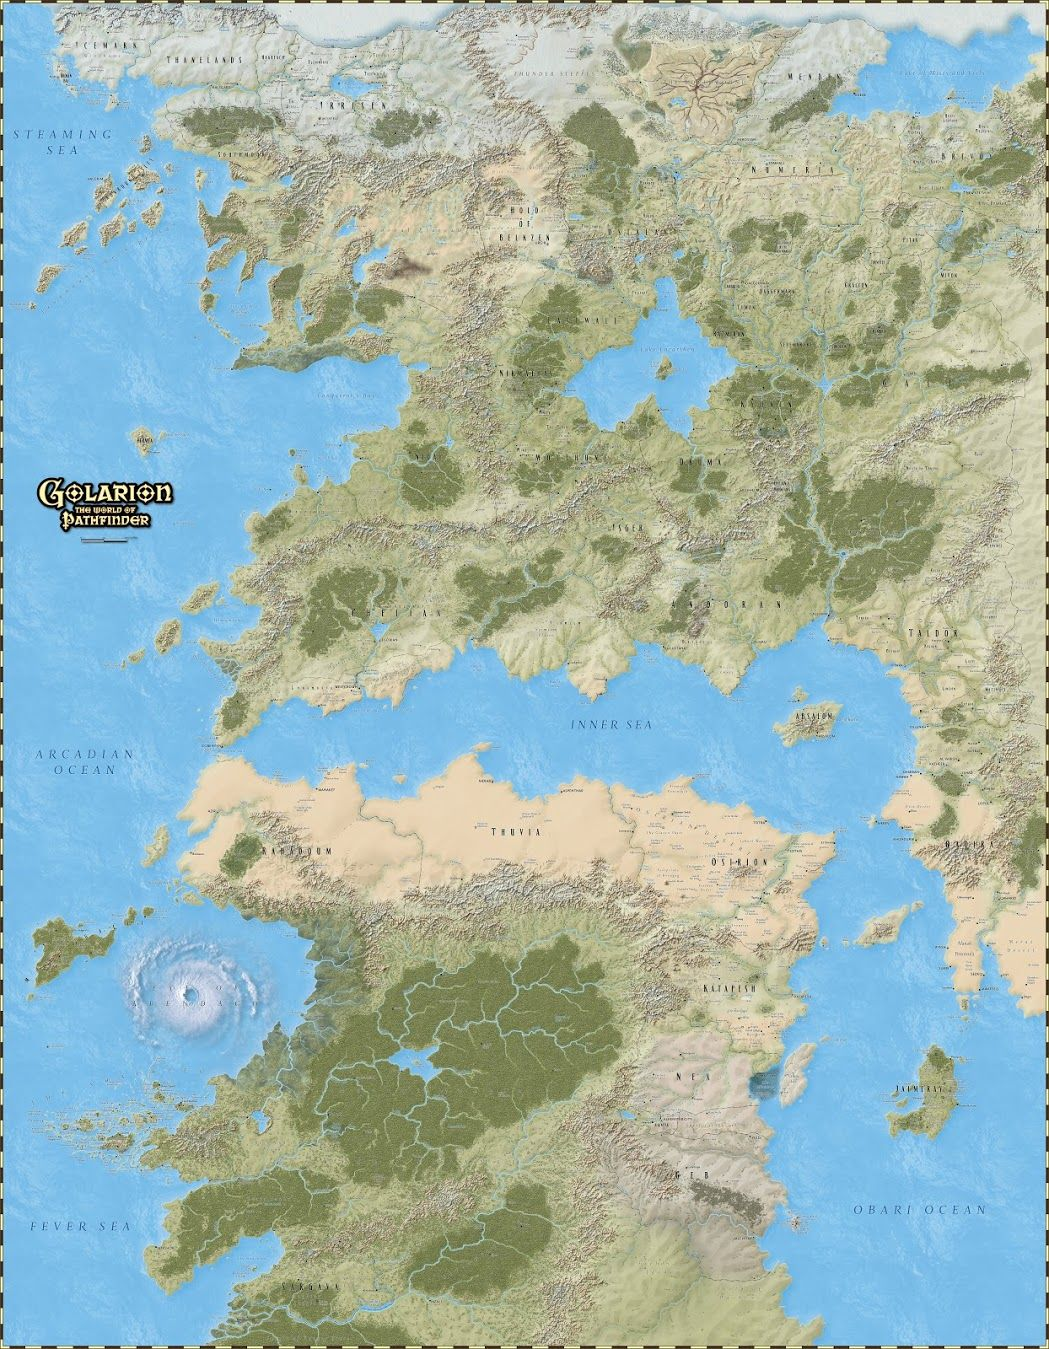 Golarion Map Pathfinder : golarion, pathfinder, Näytetään, Golarion_map_web.jpg, Poster,, Fantasy, World, Pathfinder